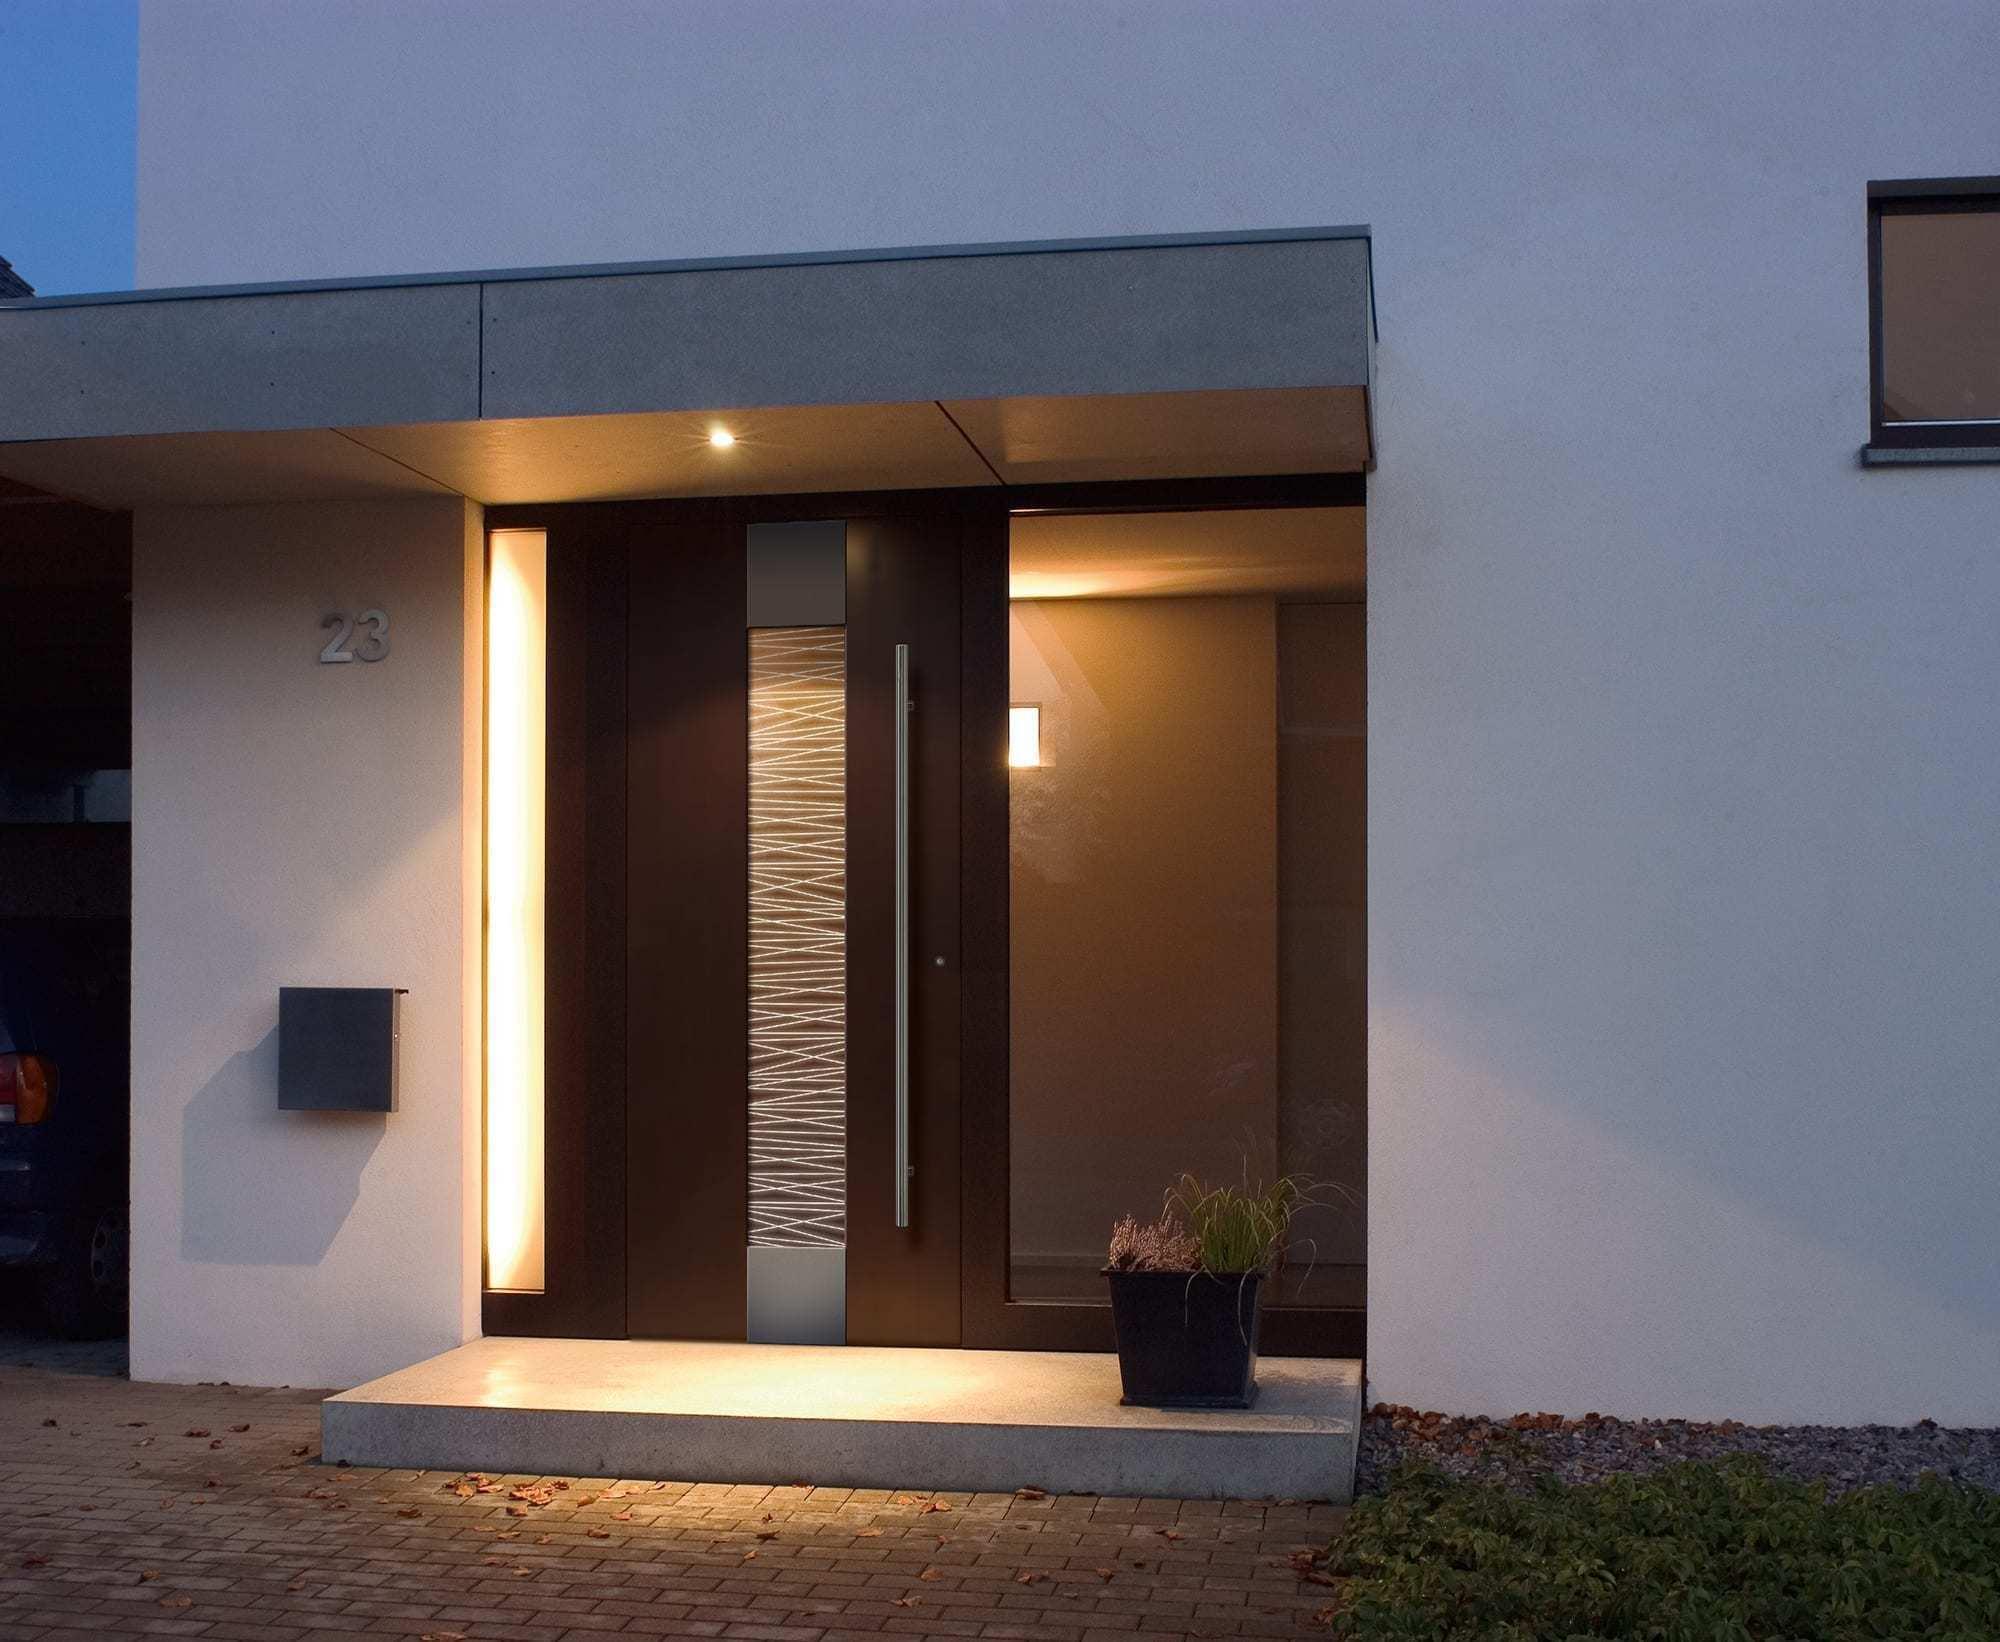 k mmerling 76 haust r aluclip innen ffnend k mmerling. Black Bedroom Furniture Sets. Home Design Ideas